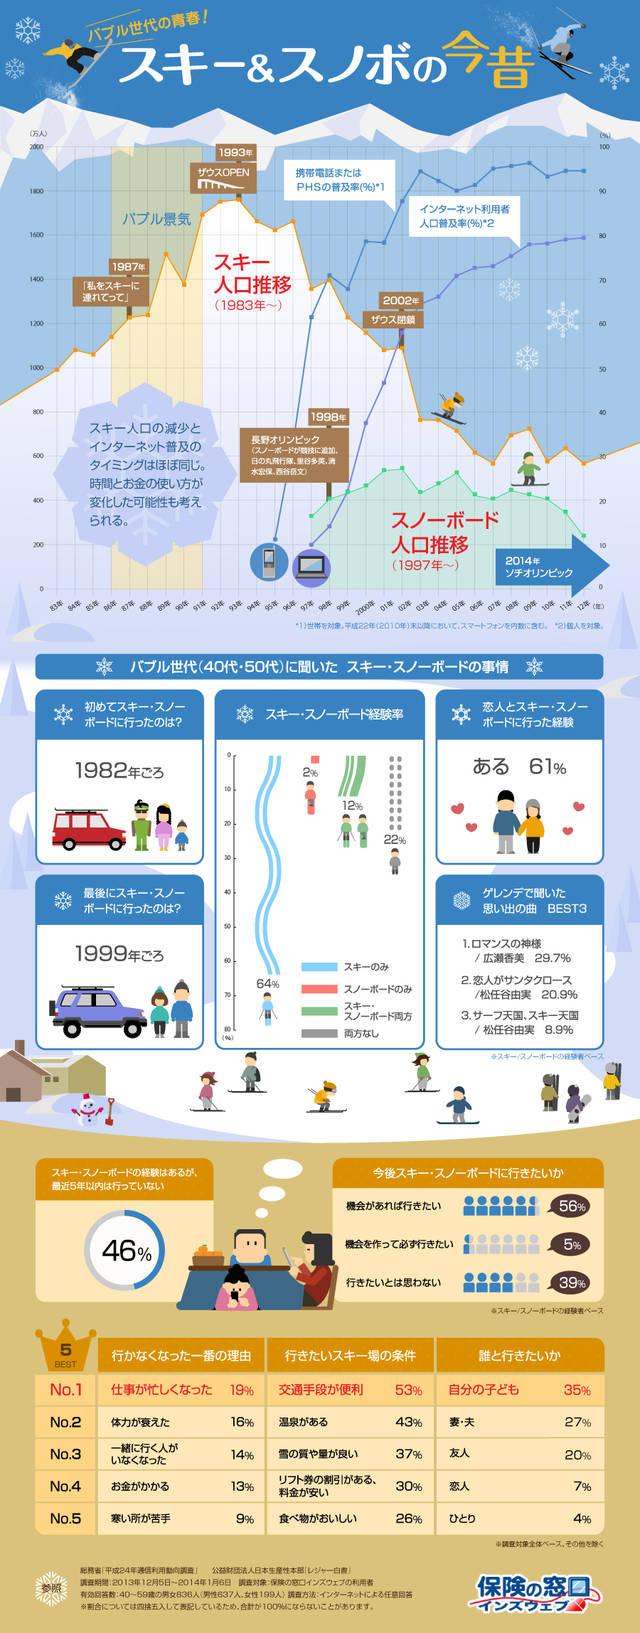 Ski infographic 900